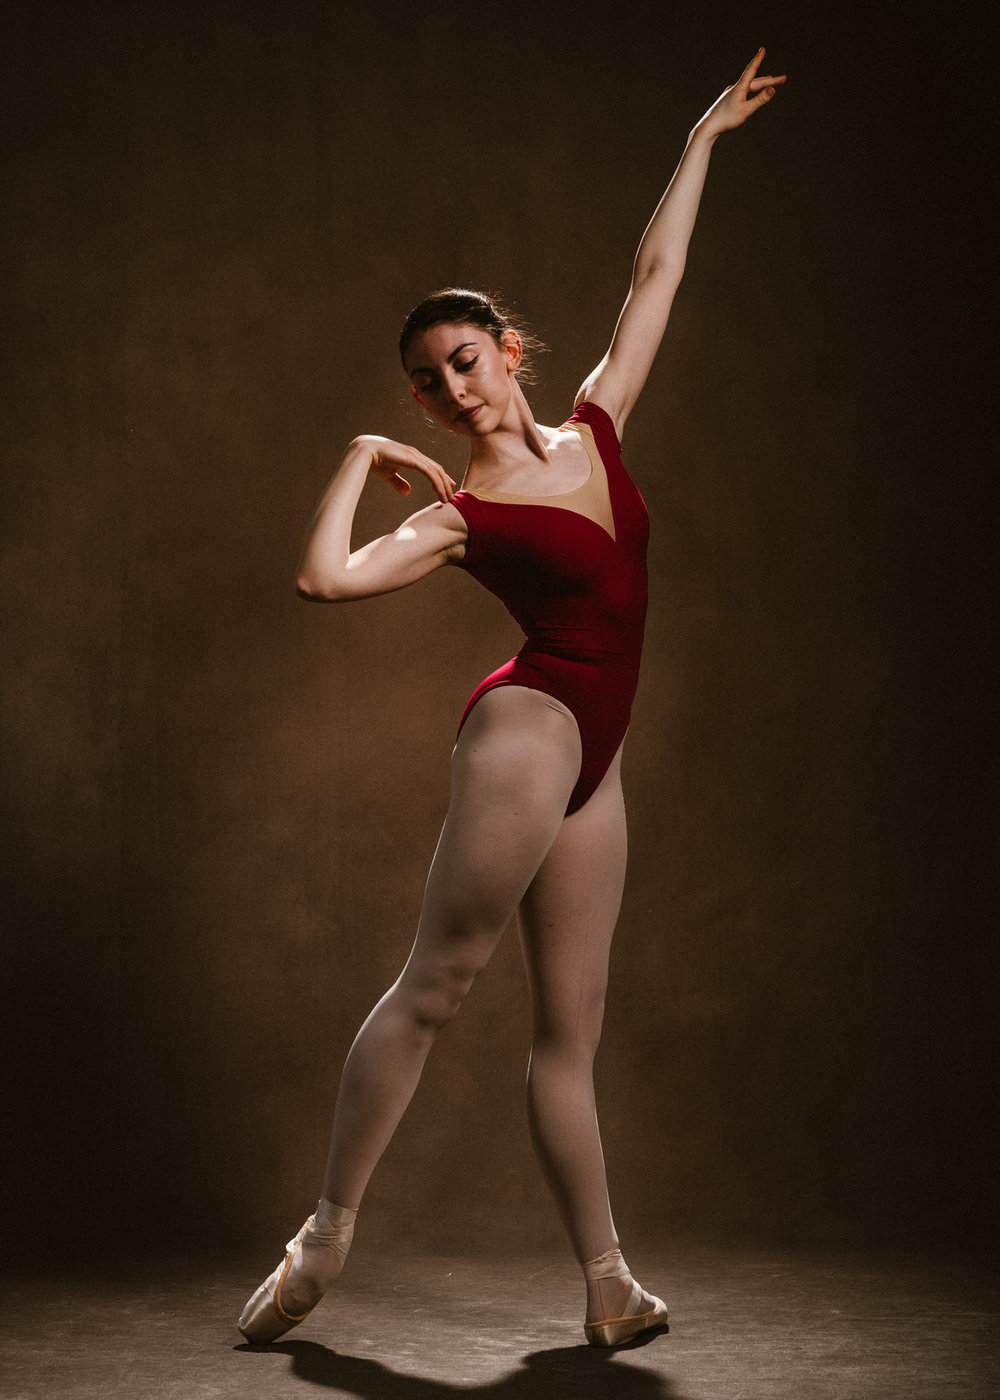 Sarah_Nolan_Ballet_031.jpg